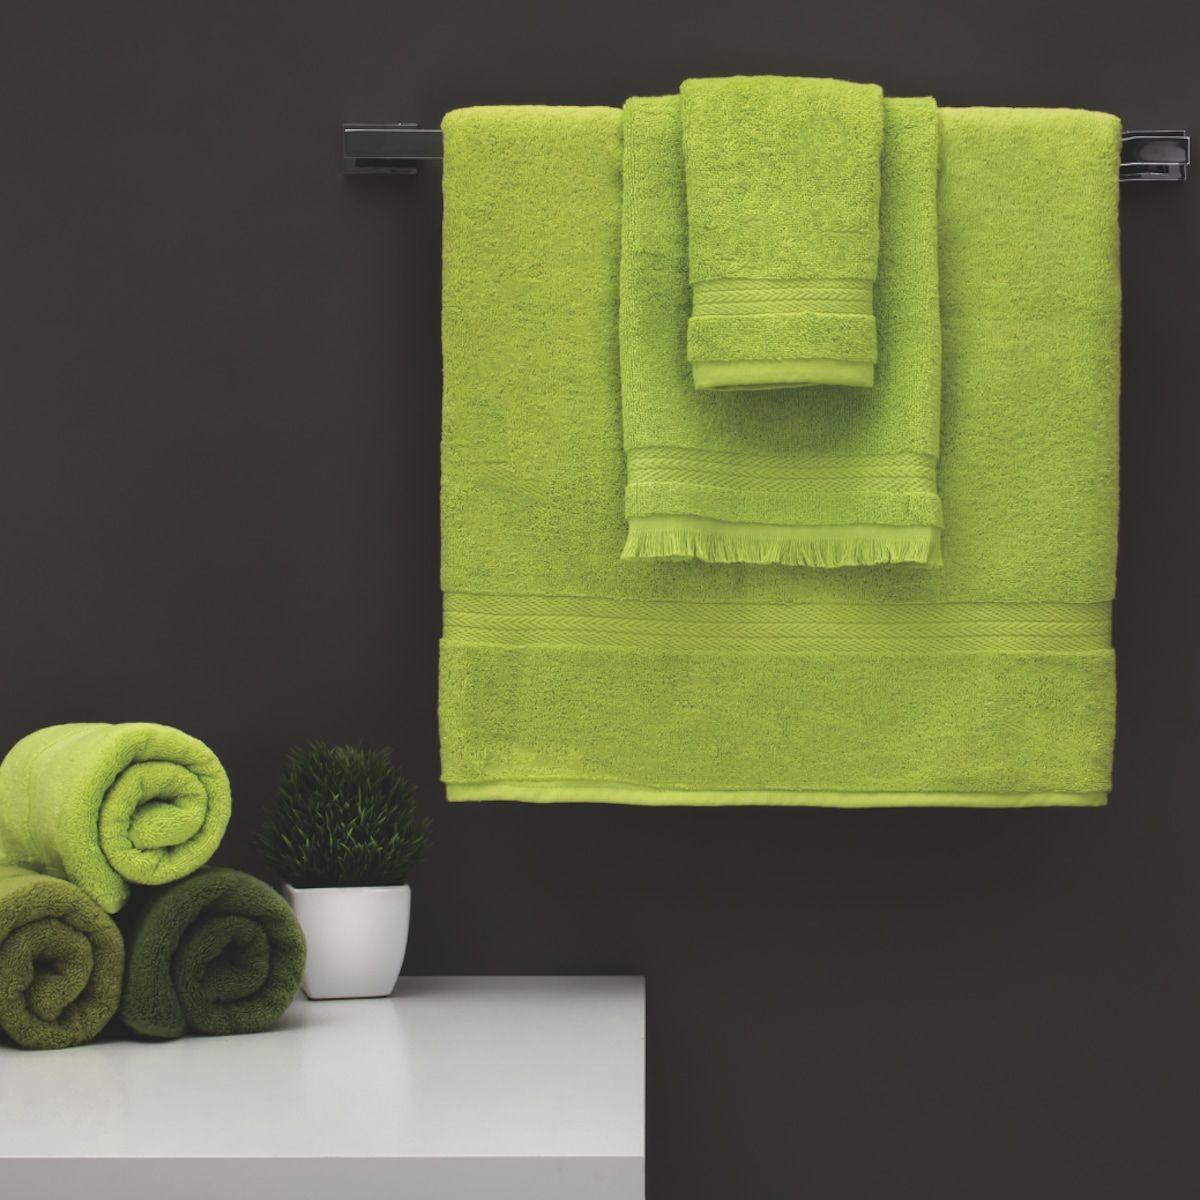 Mnsruu Serviette de Bain Motif Coccinelle Vert 76 x 38 cm